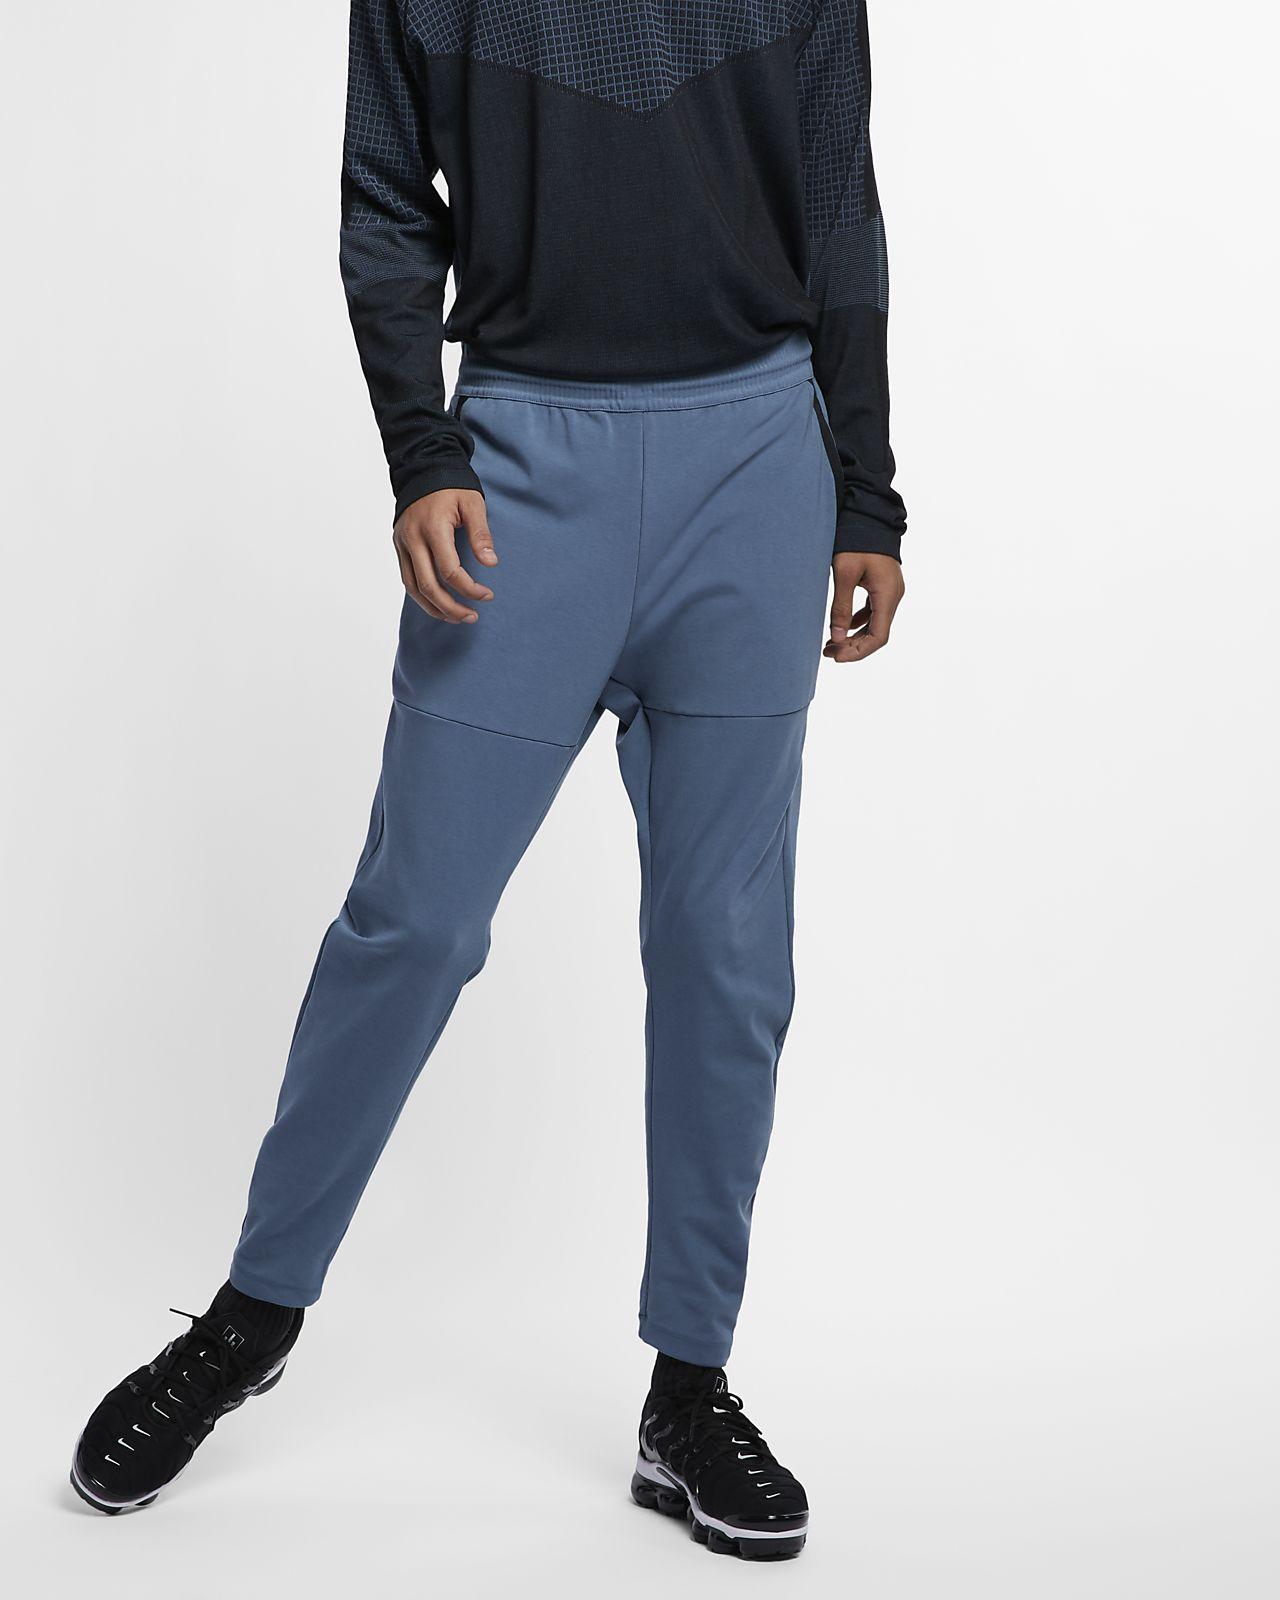 Мужские брюки из трикотажного материала Nike Sportswear Tech Pack